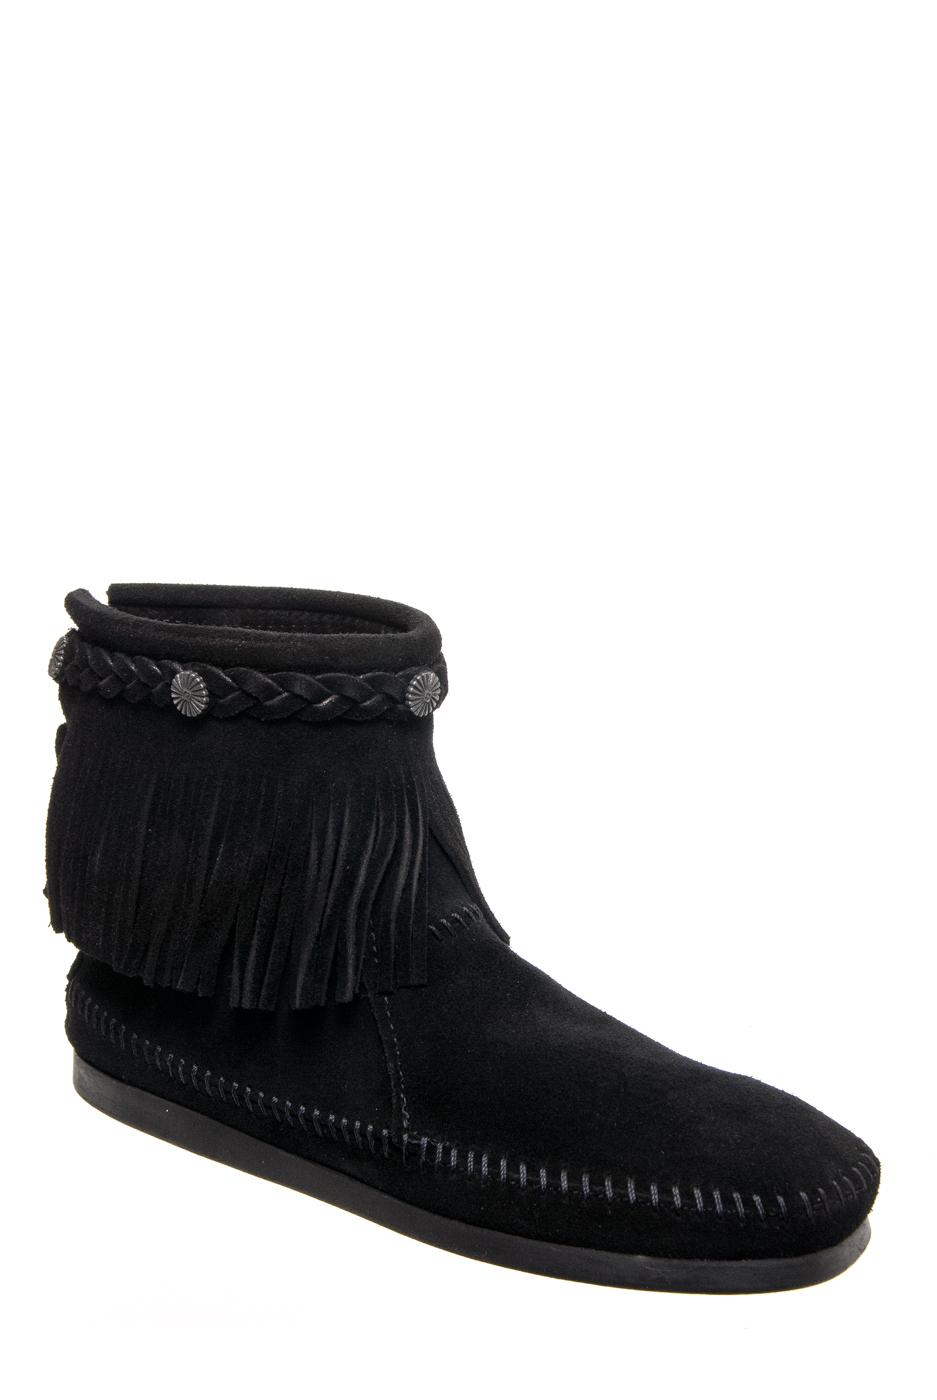 Minnetonka Fringed Ankle Boots - Black